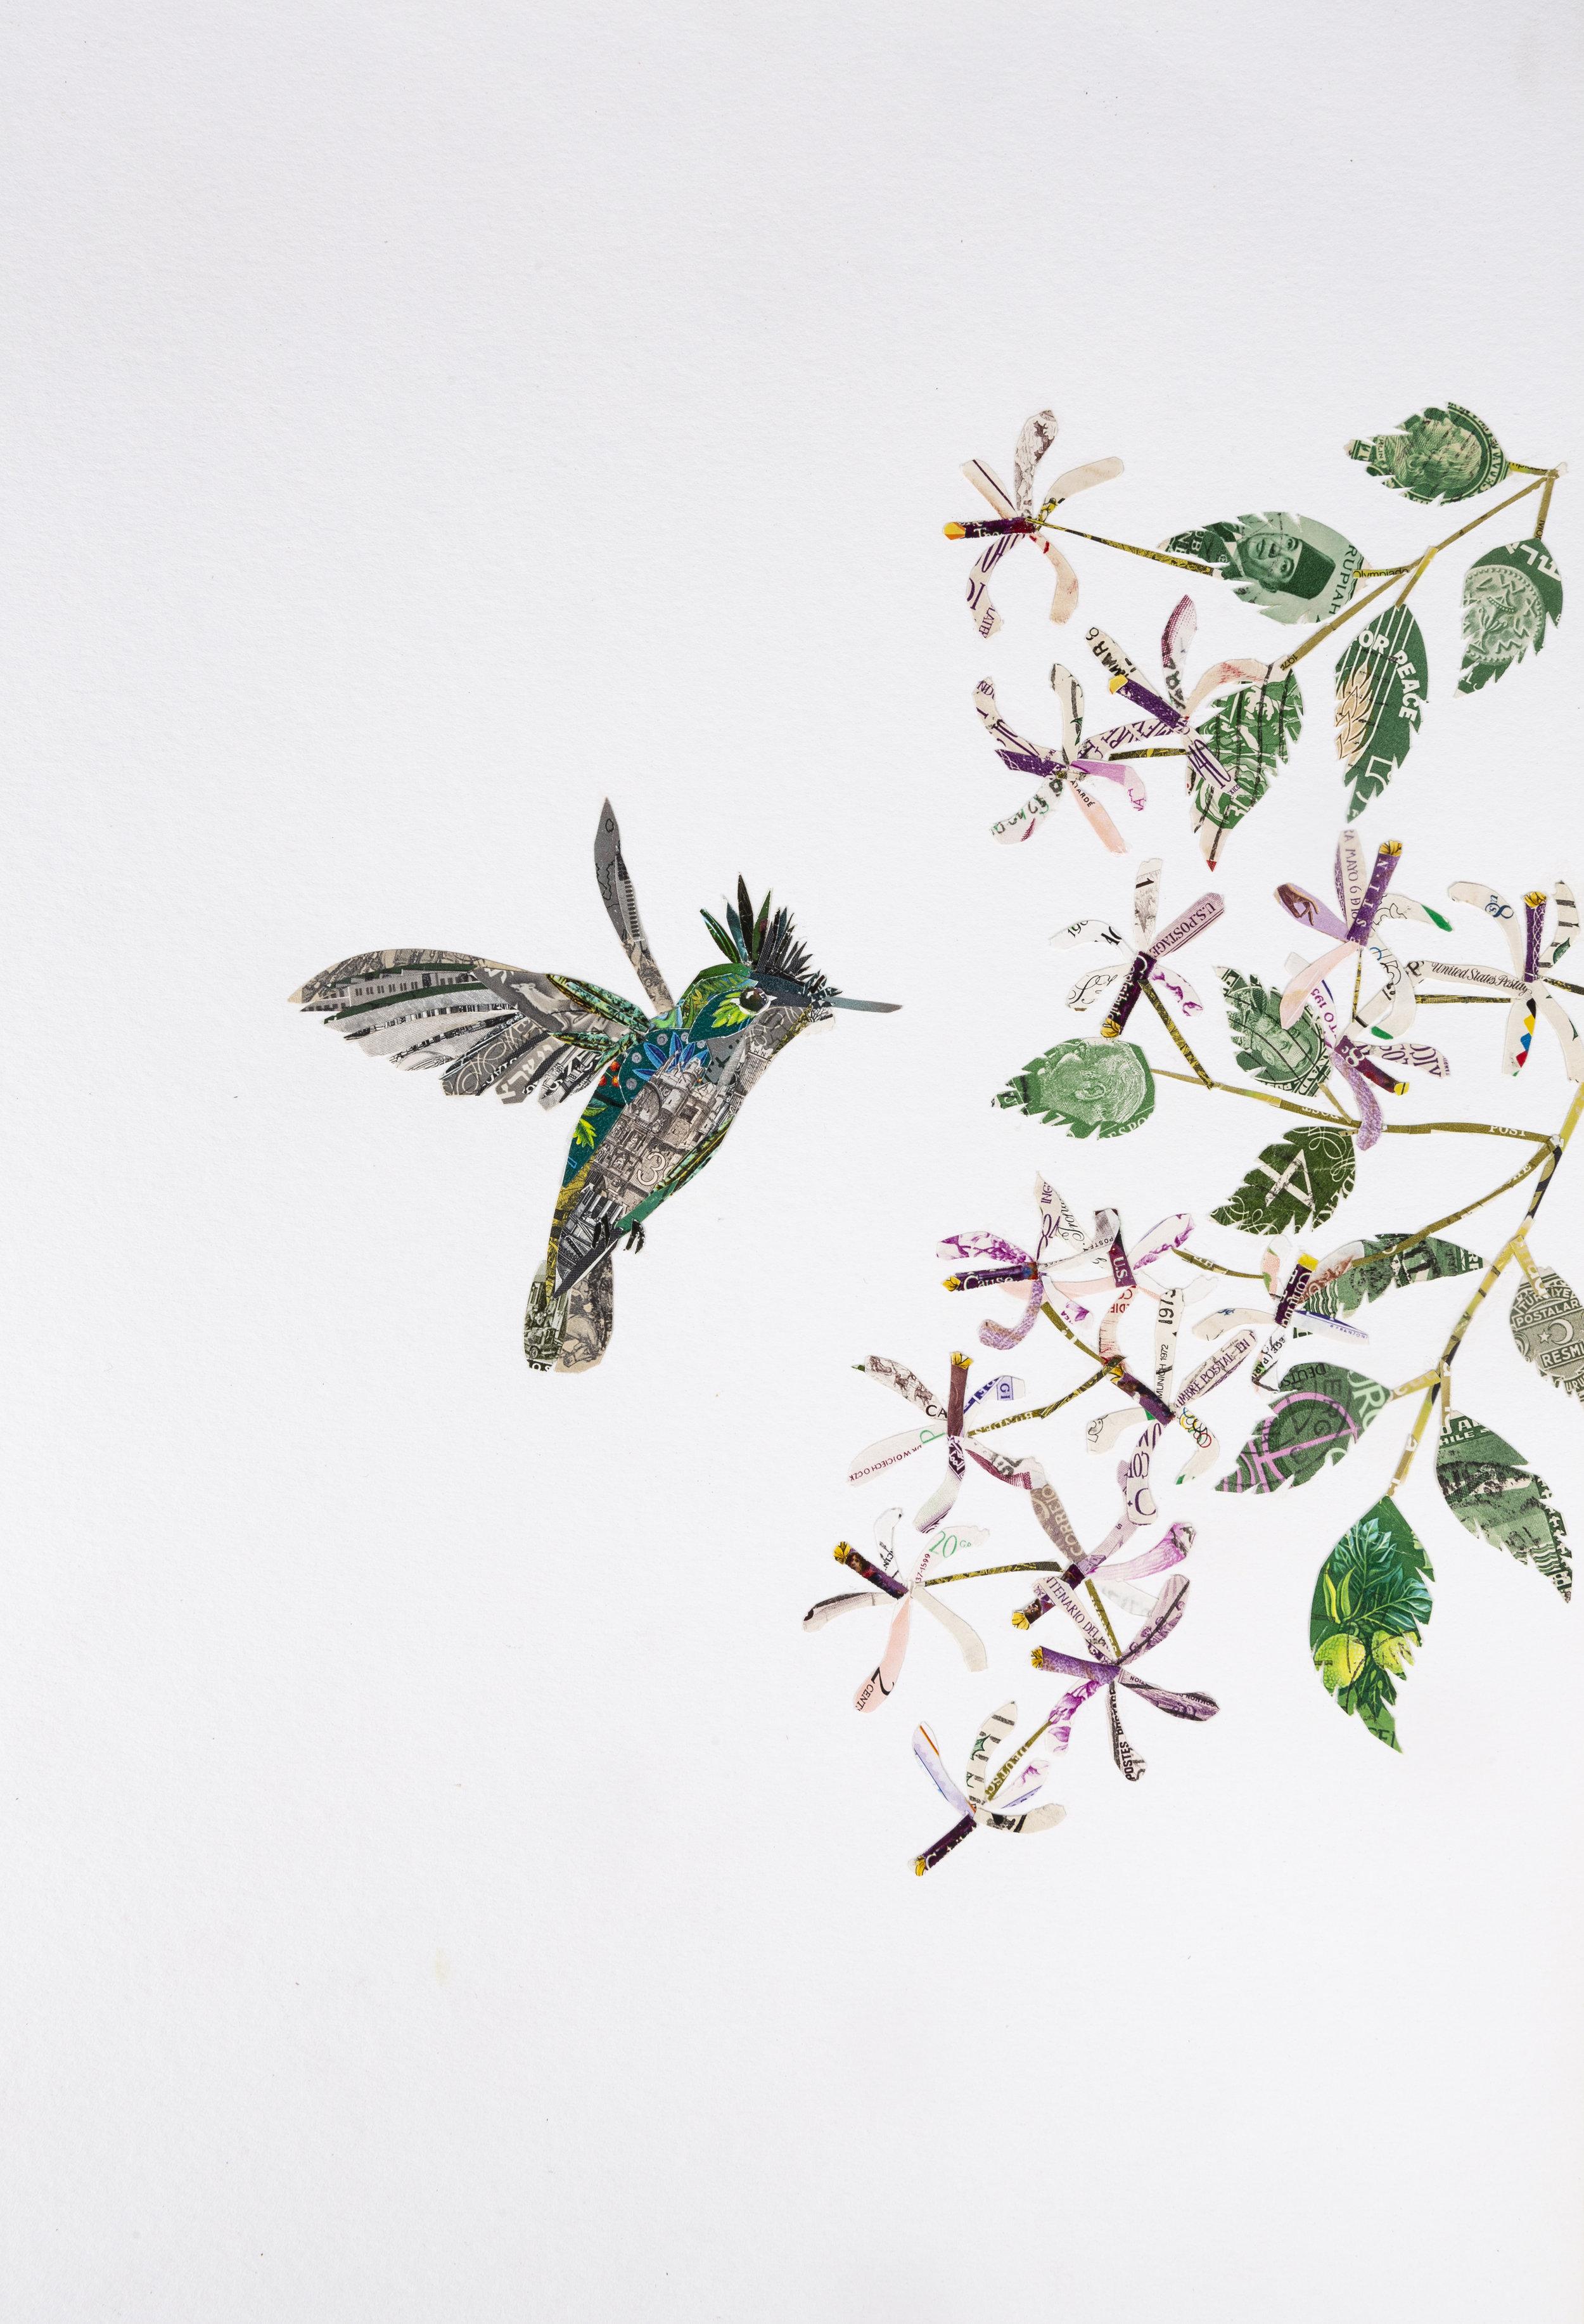 Antillean Crested Hummingbird, 2017